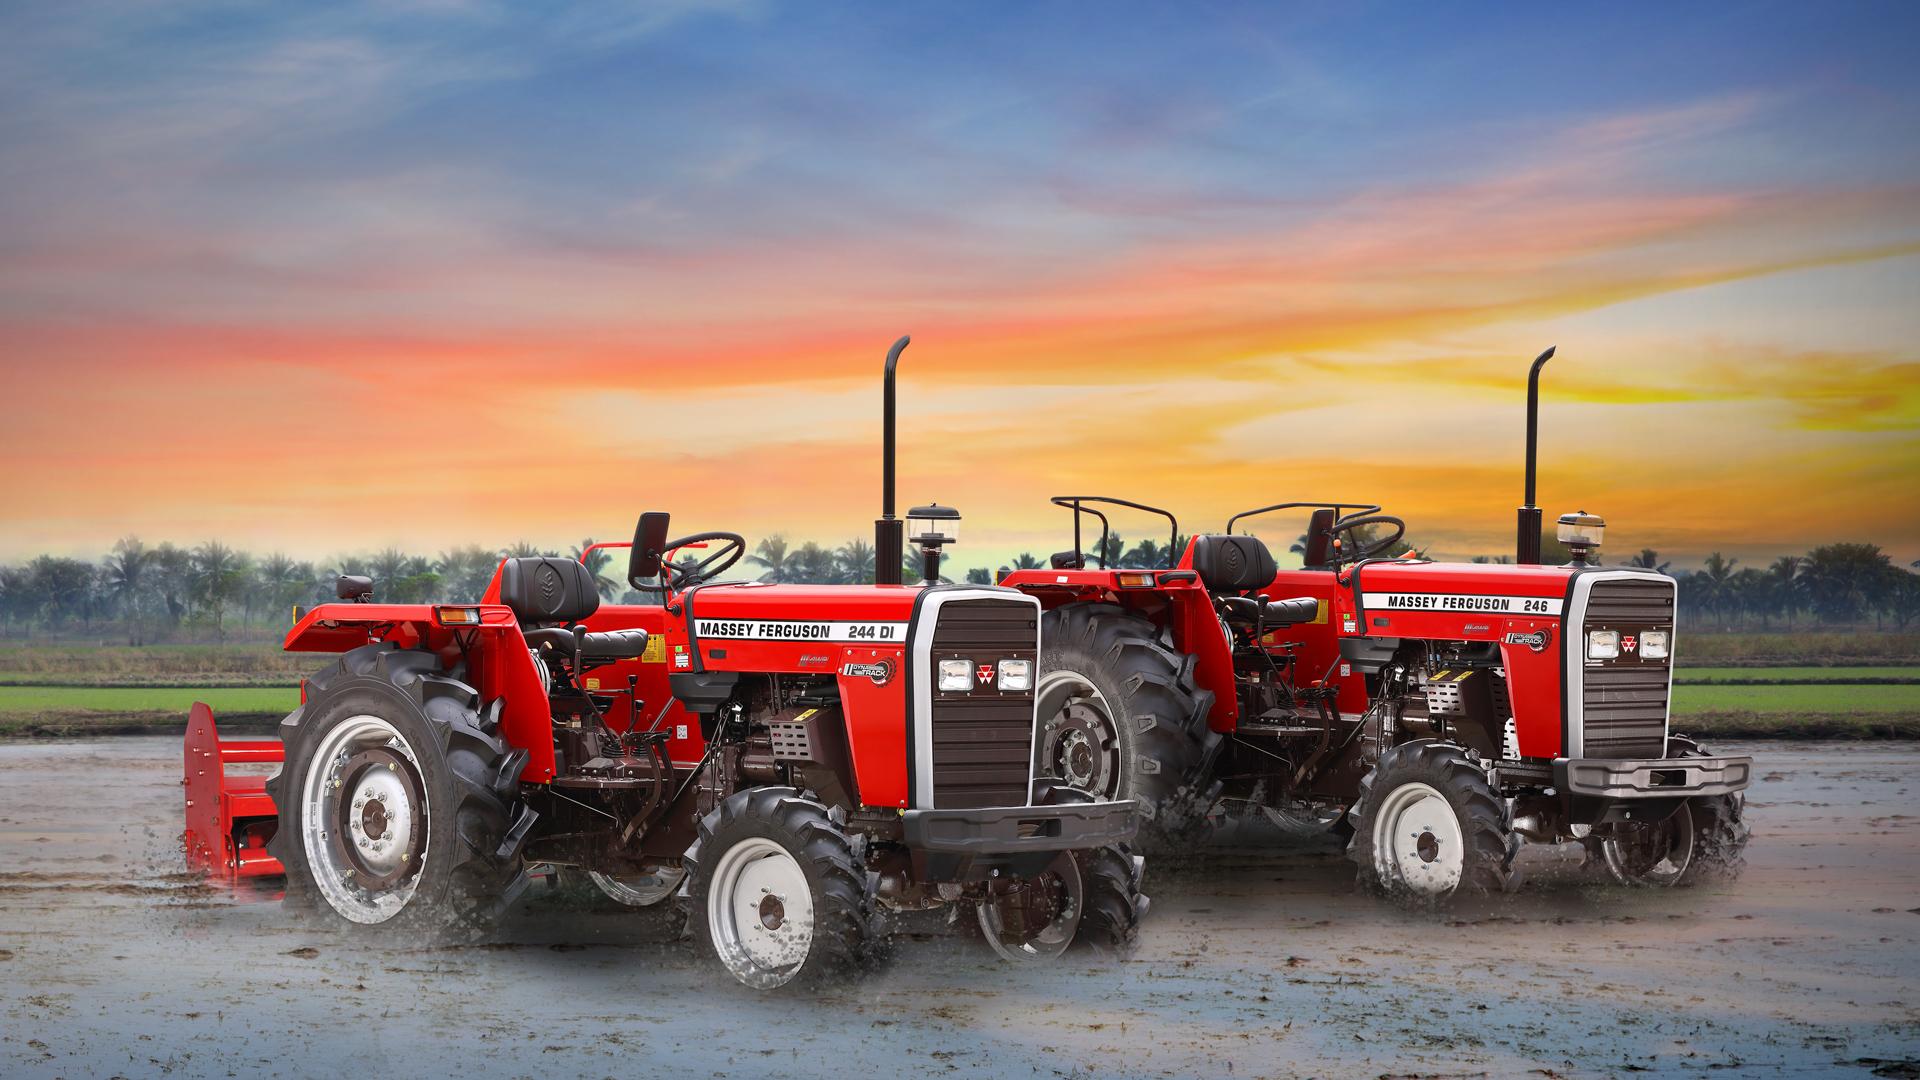 TAFE Launches Massey Ferguson 244 & 246 DYNATRACK – 4WD Tractors For West Bengal & Odisha